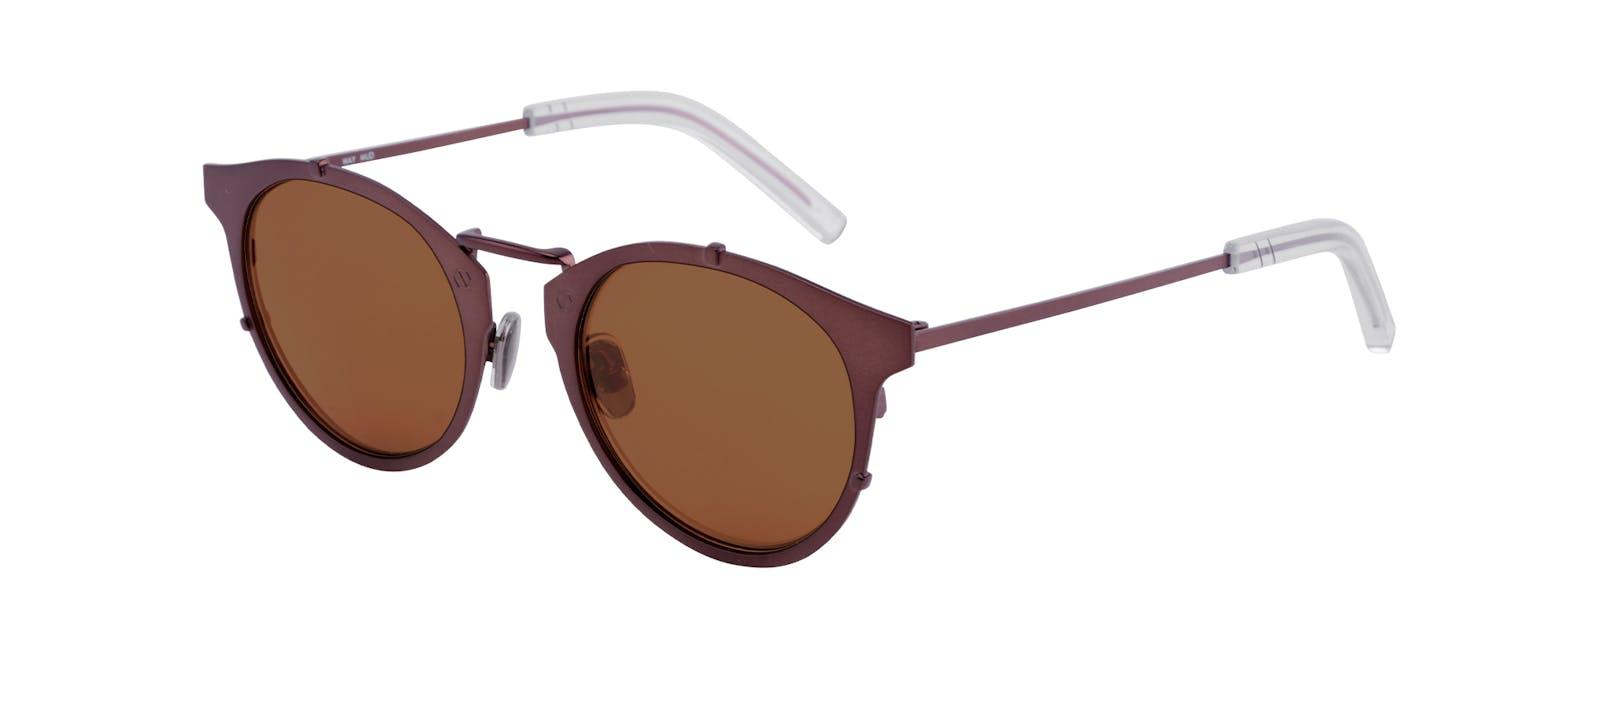 92965a34d48 Affordable Fashion Glasses Round Sunglasses Men Way Mud Tilt